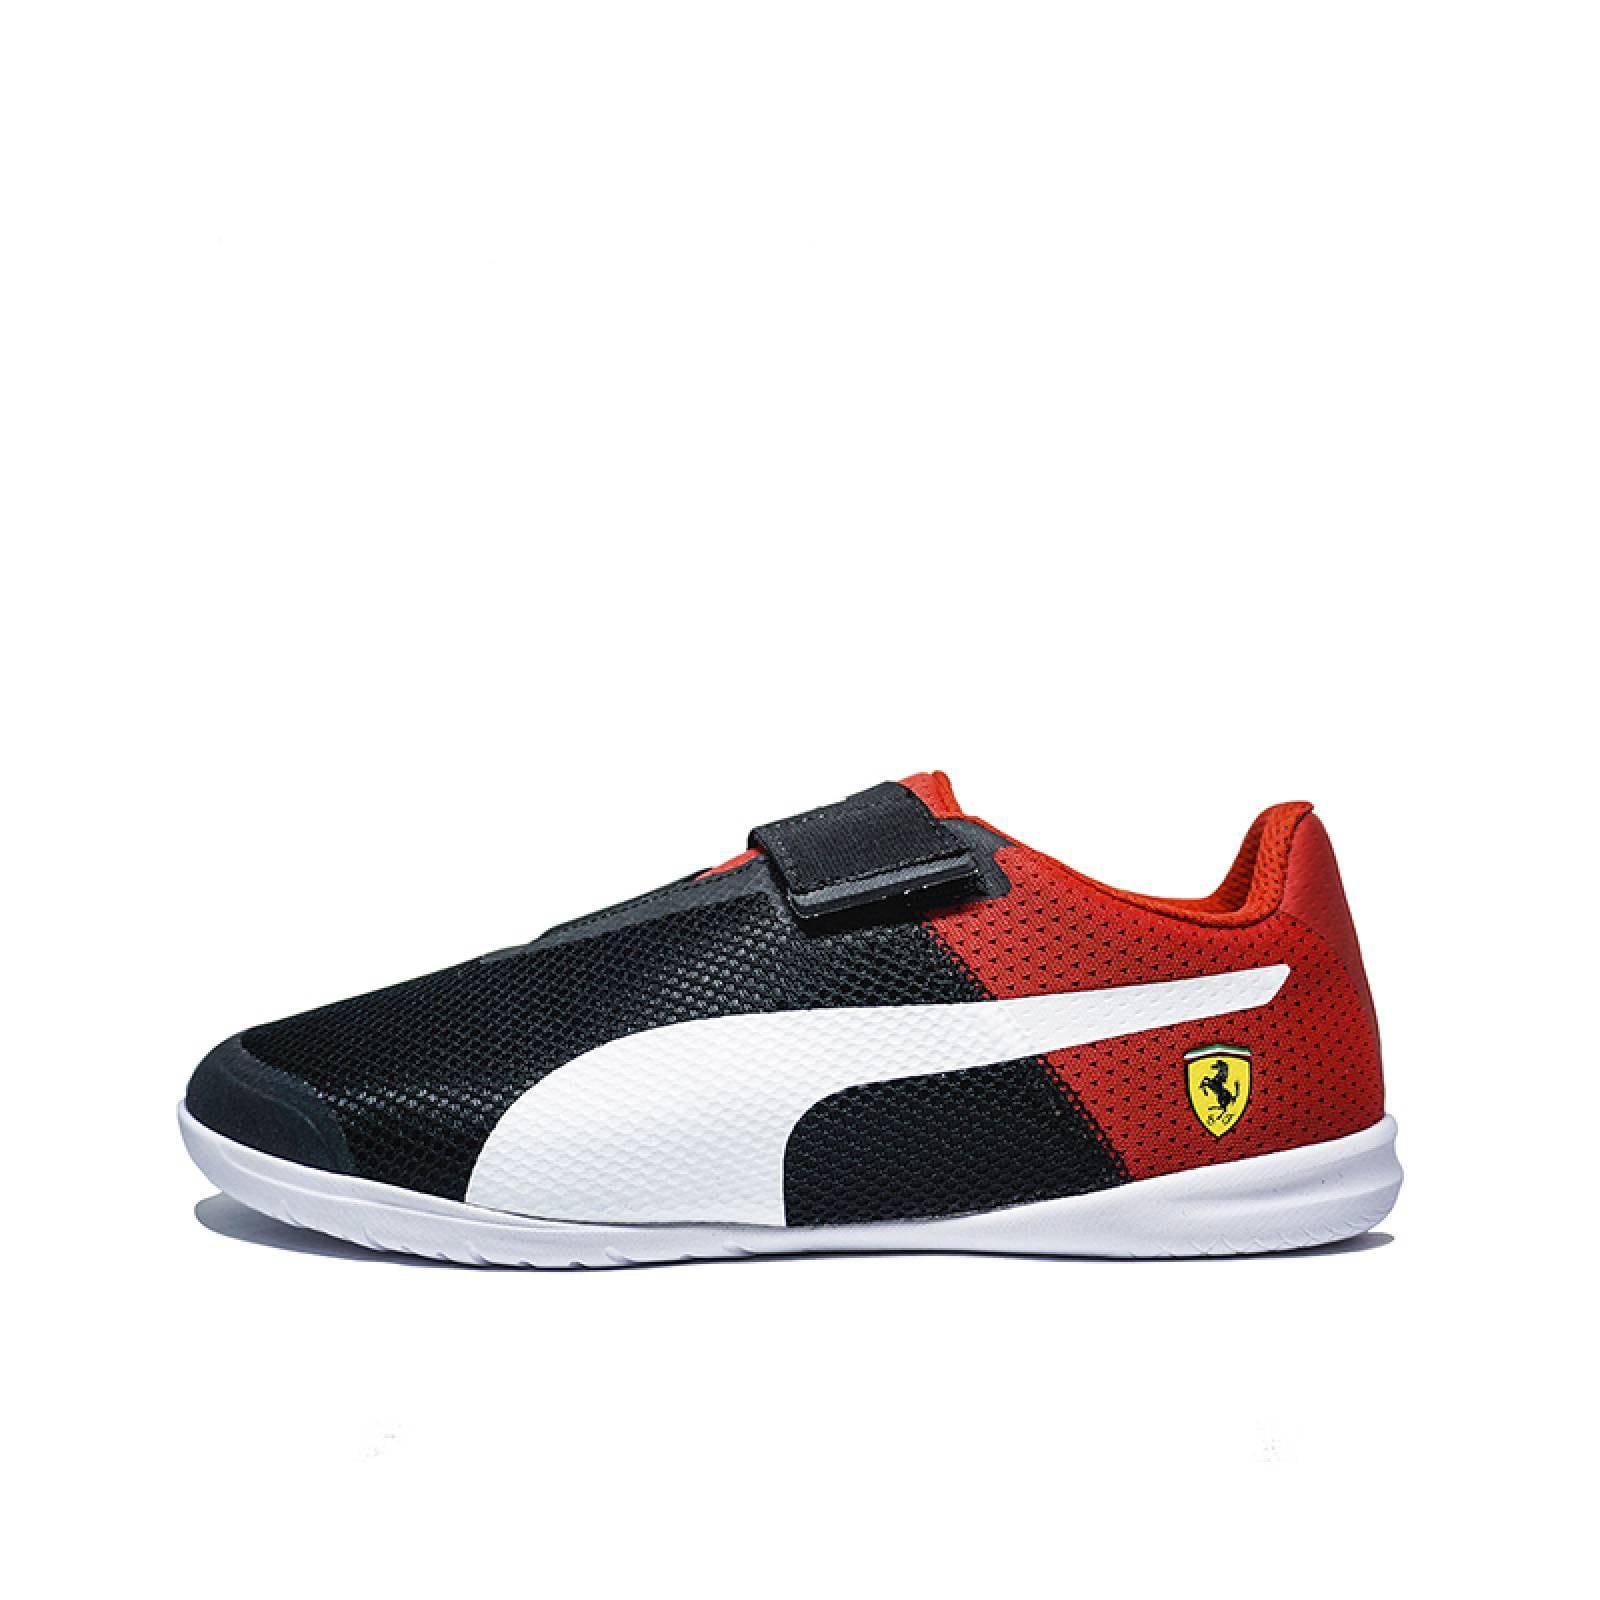 Tenis Ferrari IGNITE Strap - Puma